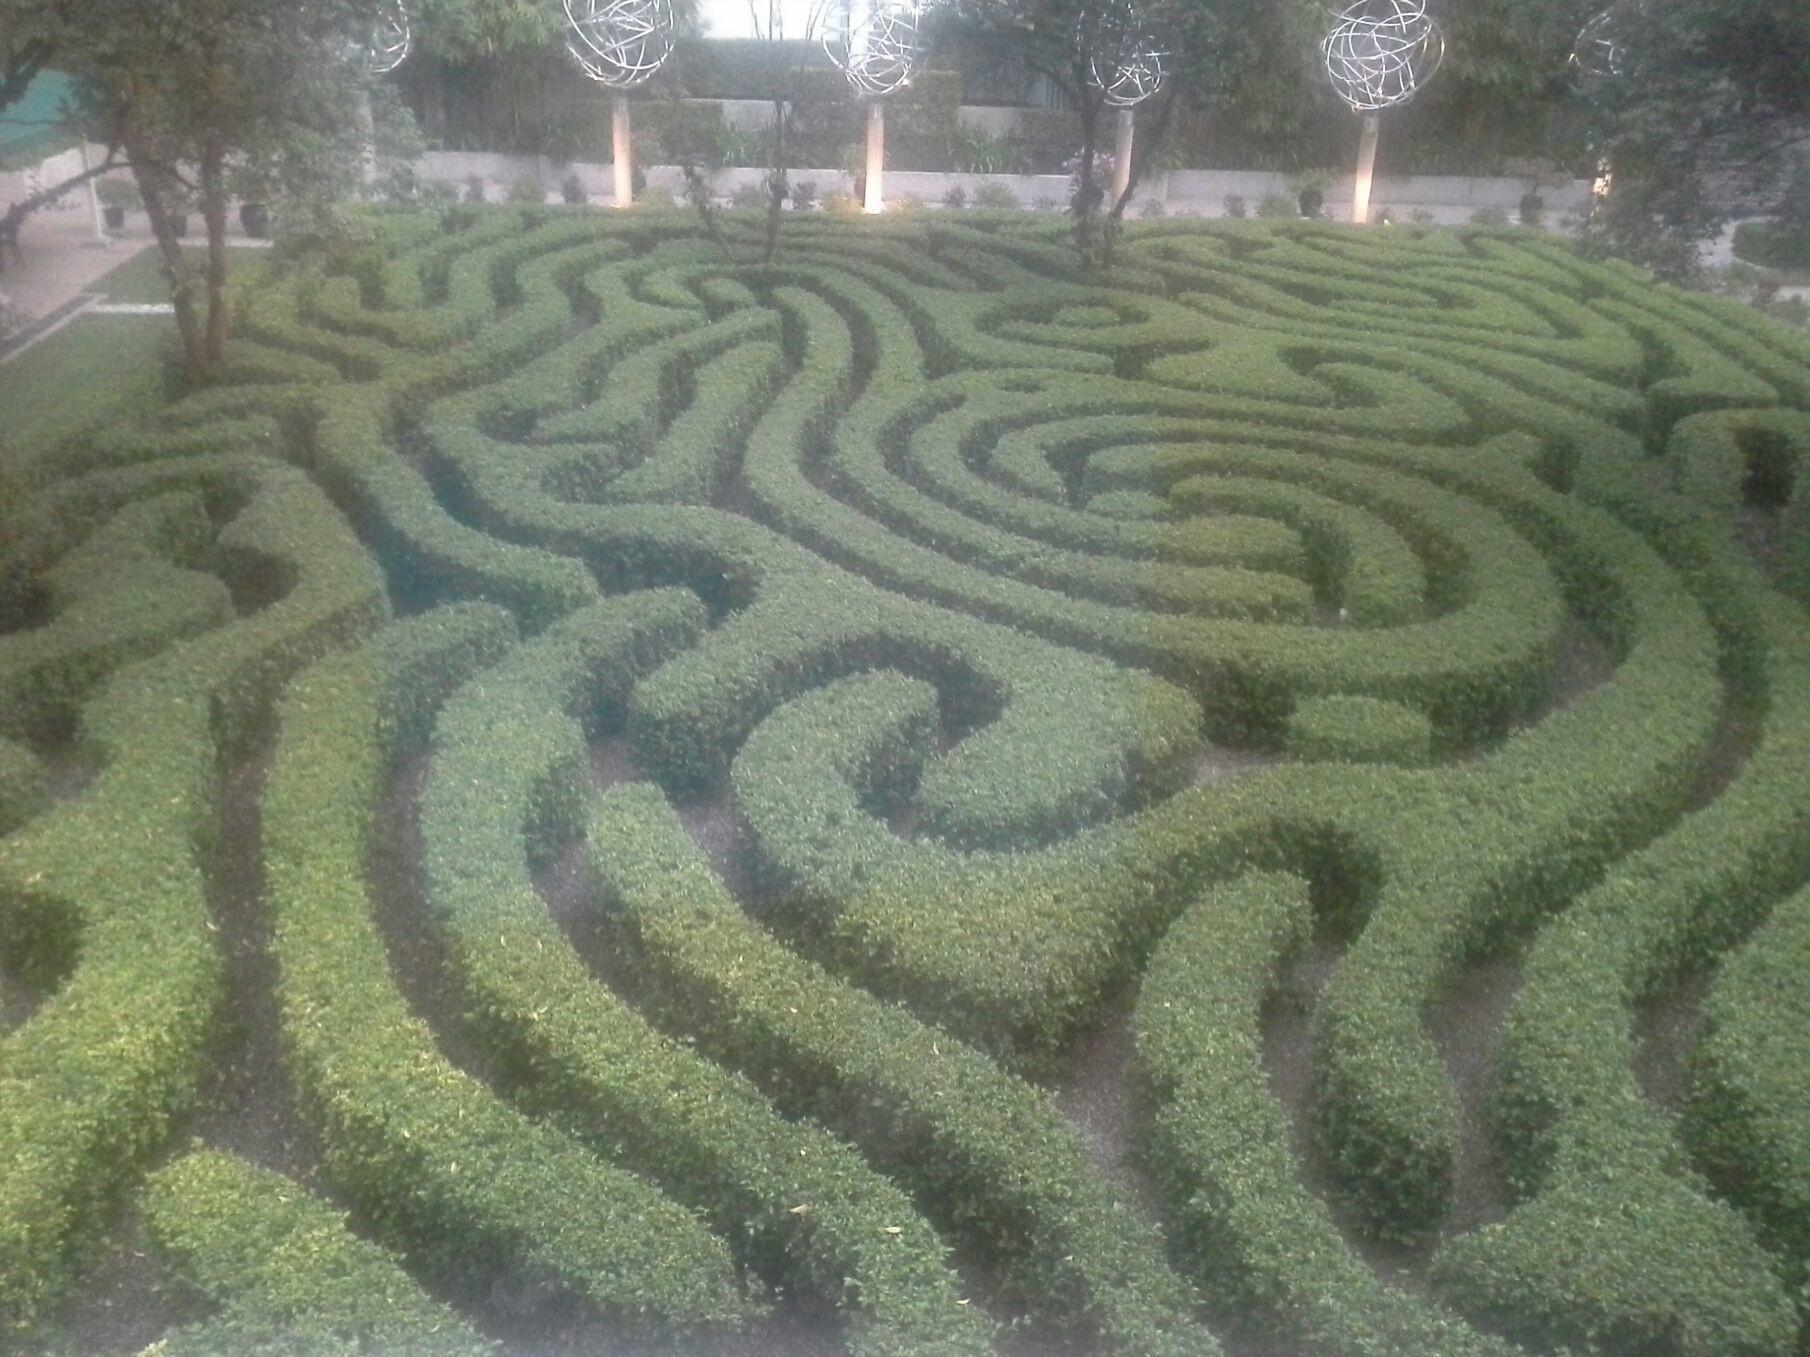 Maze Garden at Shangri-la Hotel